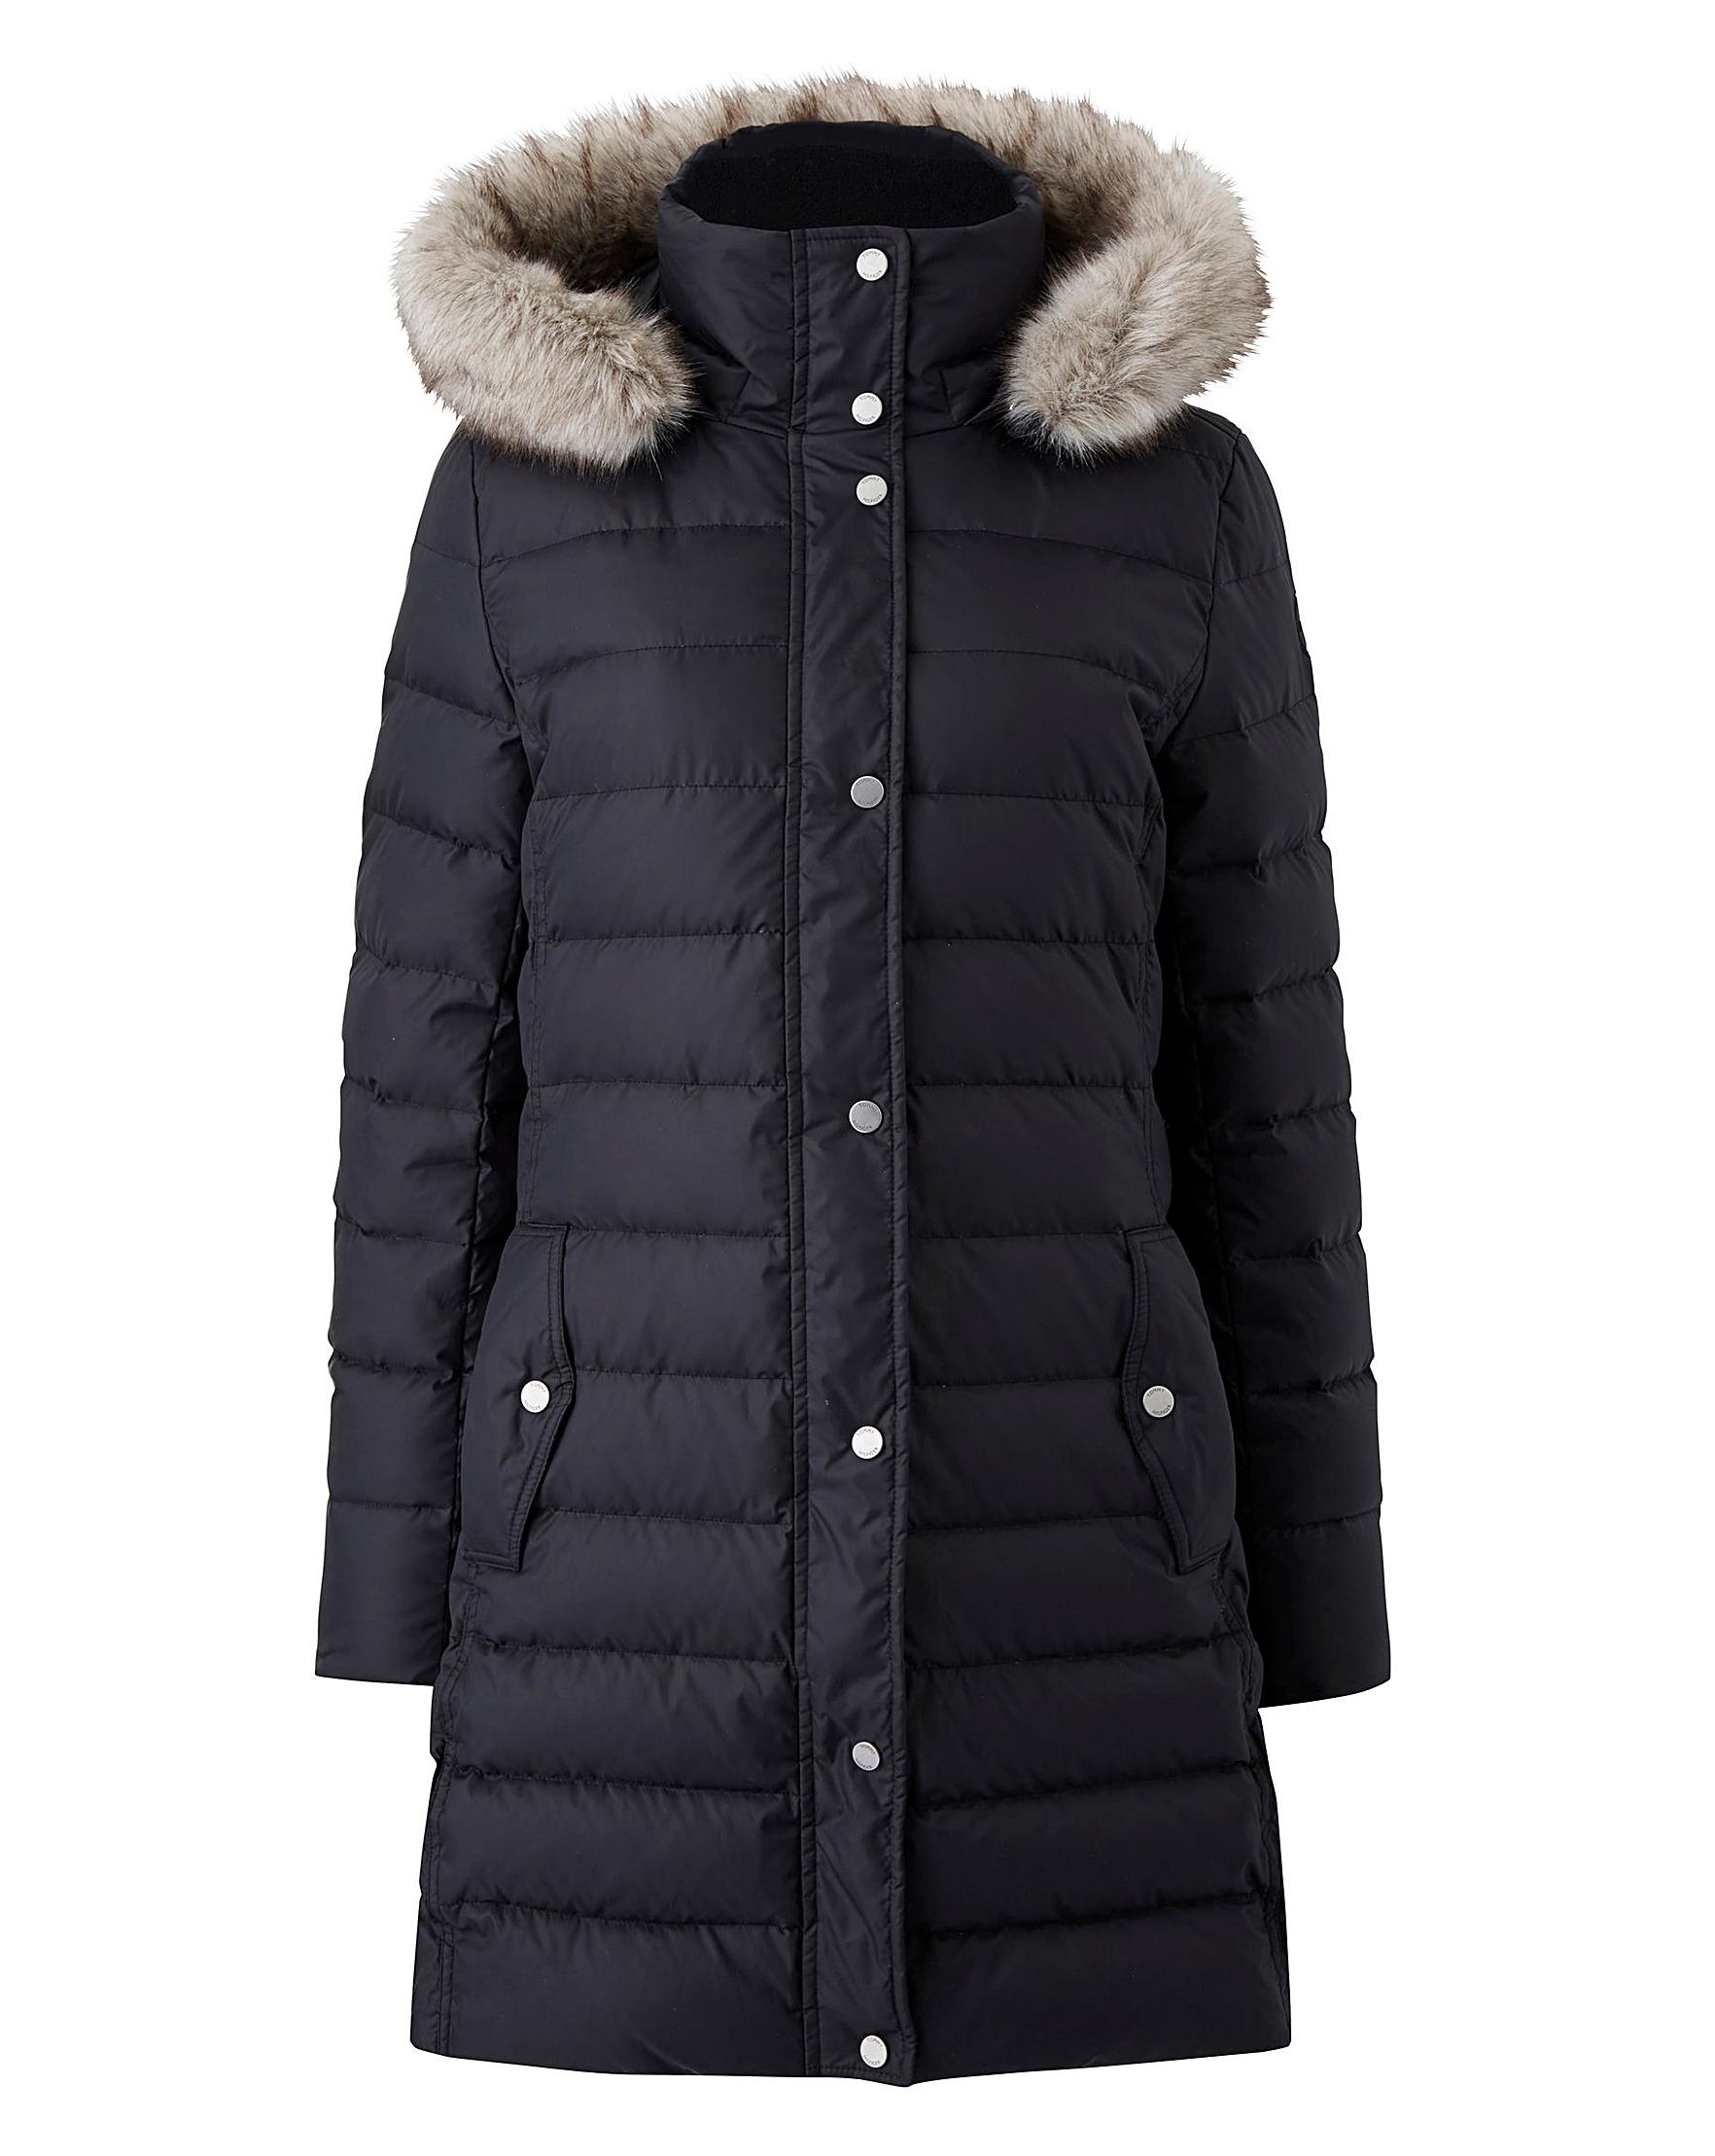 Tommy Hilfiger Tyra Down Coat   Fashion World a880a6190b